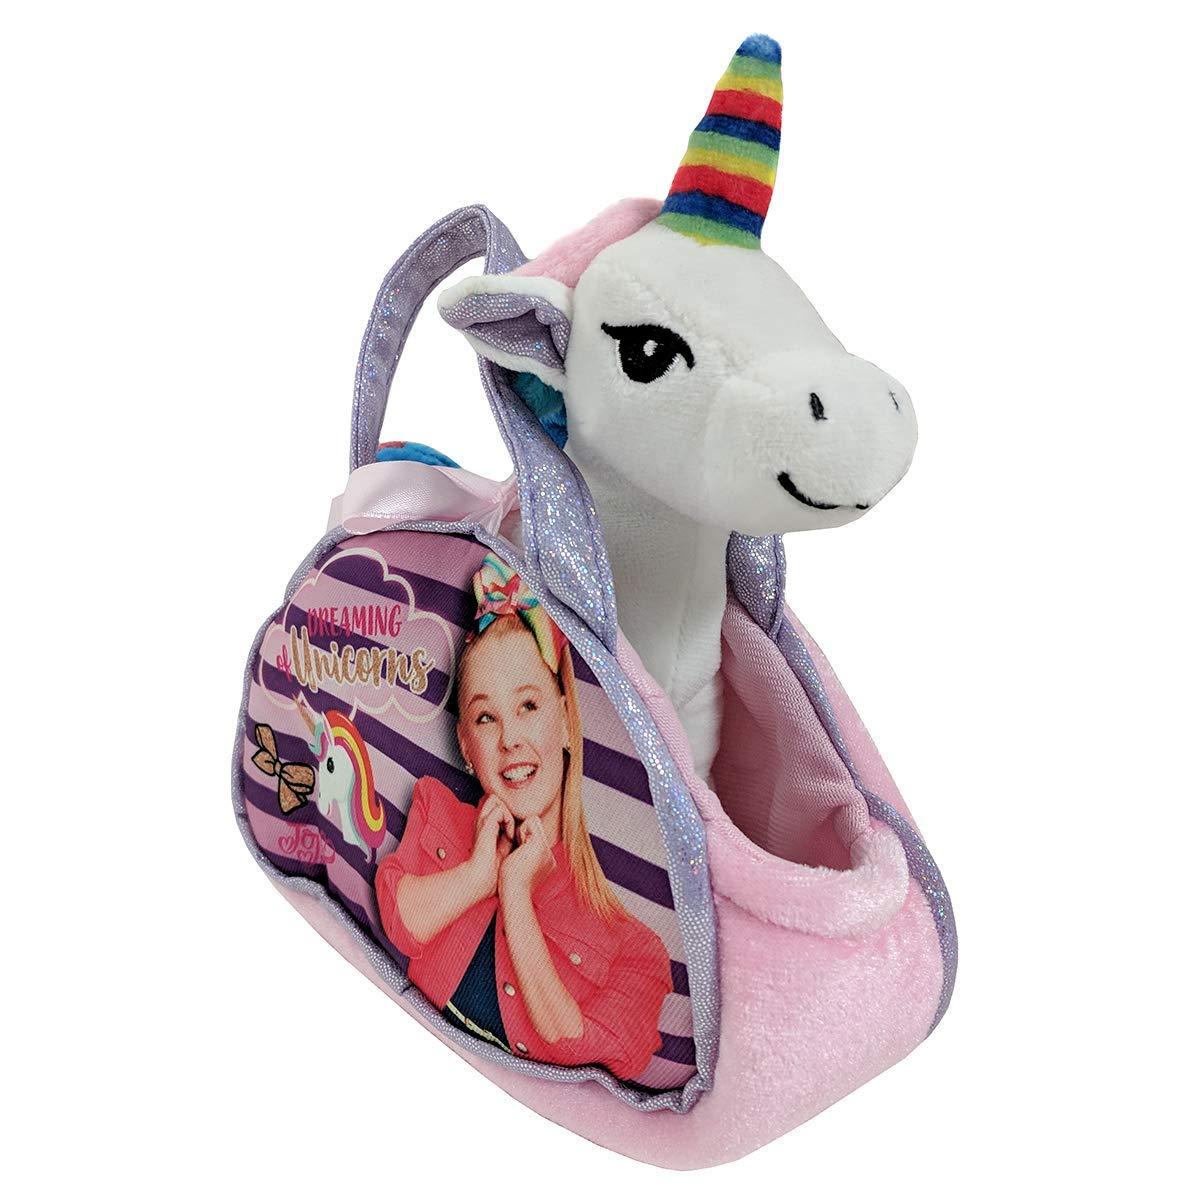 Nickelodeon JoJo Siwa Dreaming of Unicorns Purse W/Removable Plush Unicorn & JoJo Rainbow Hair Bow - Multi Value Bundle by By JoJo Siwa (Image #2)